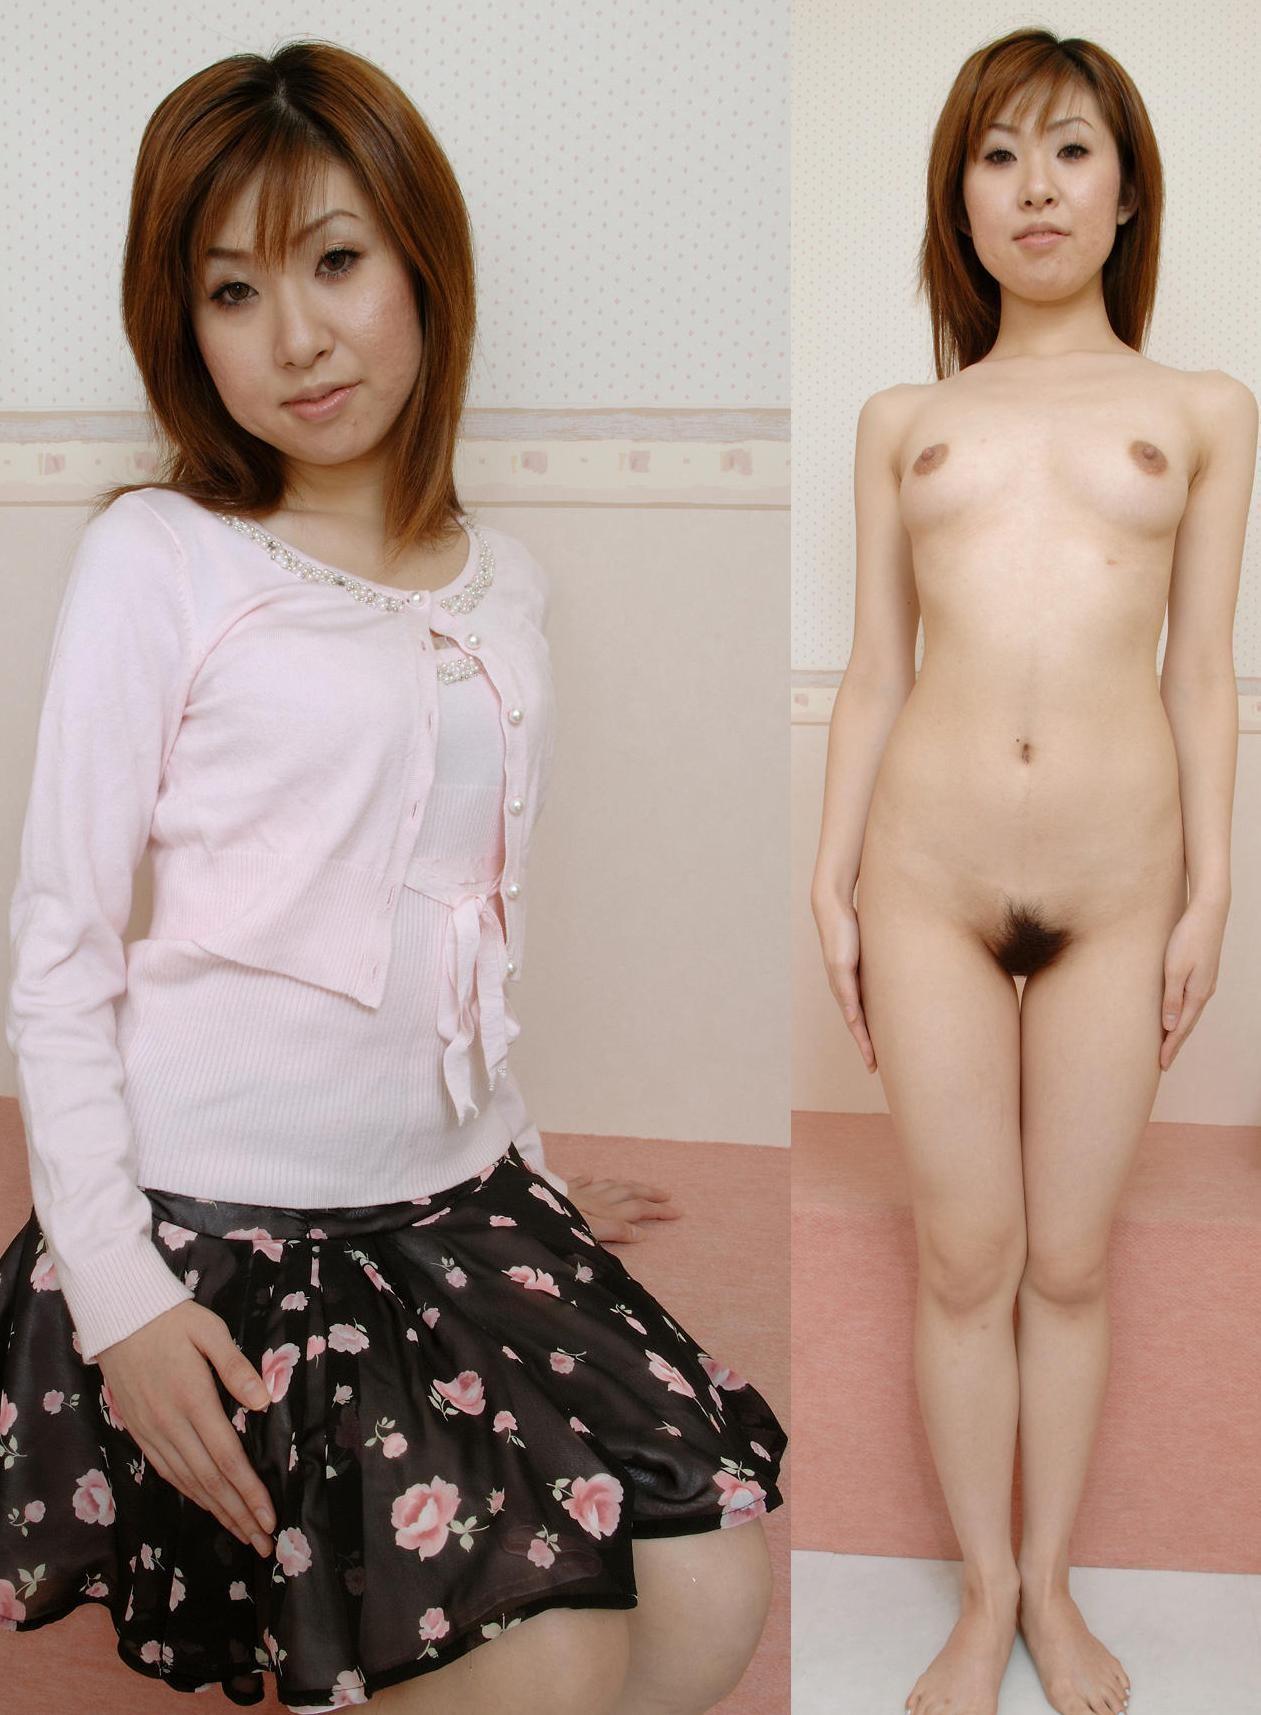 96993_asian_undressed_07_123_421lo.jpg